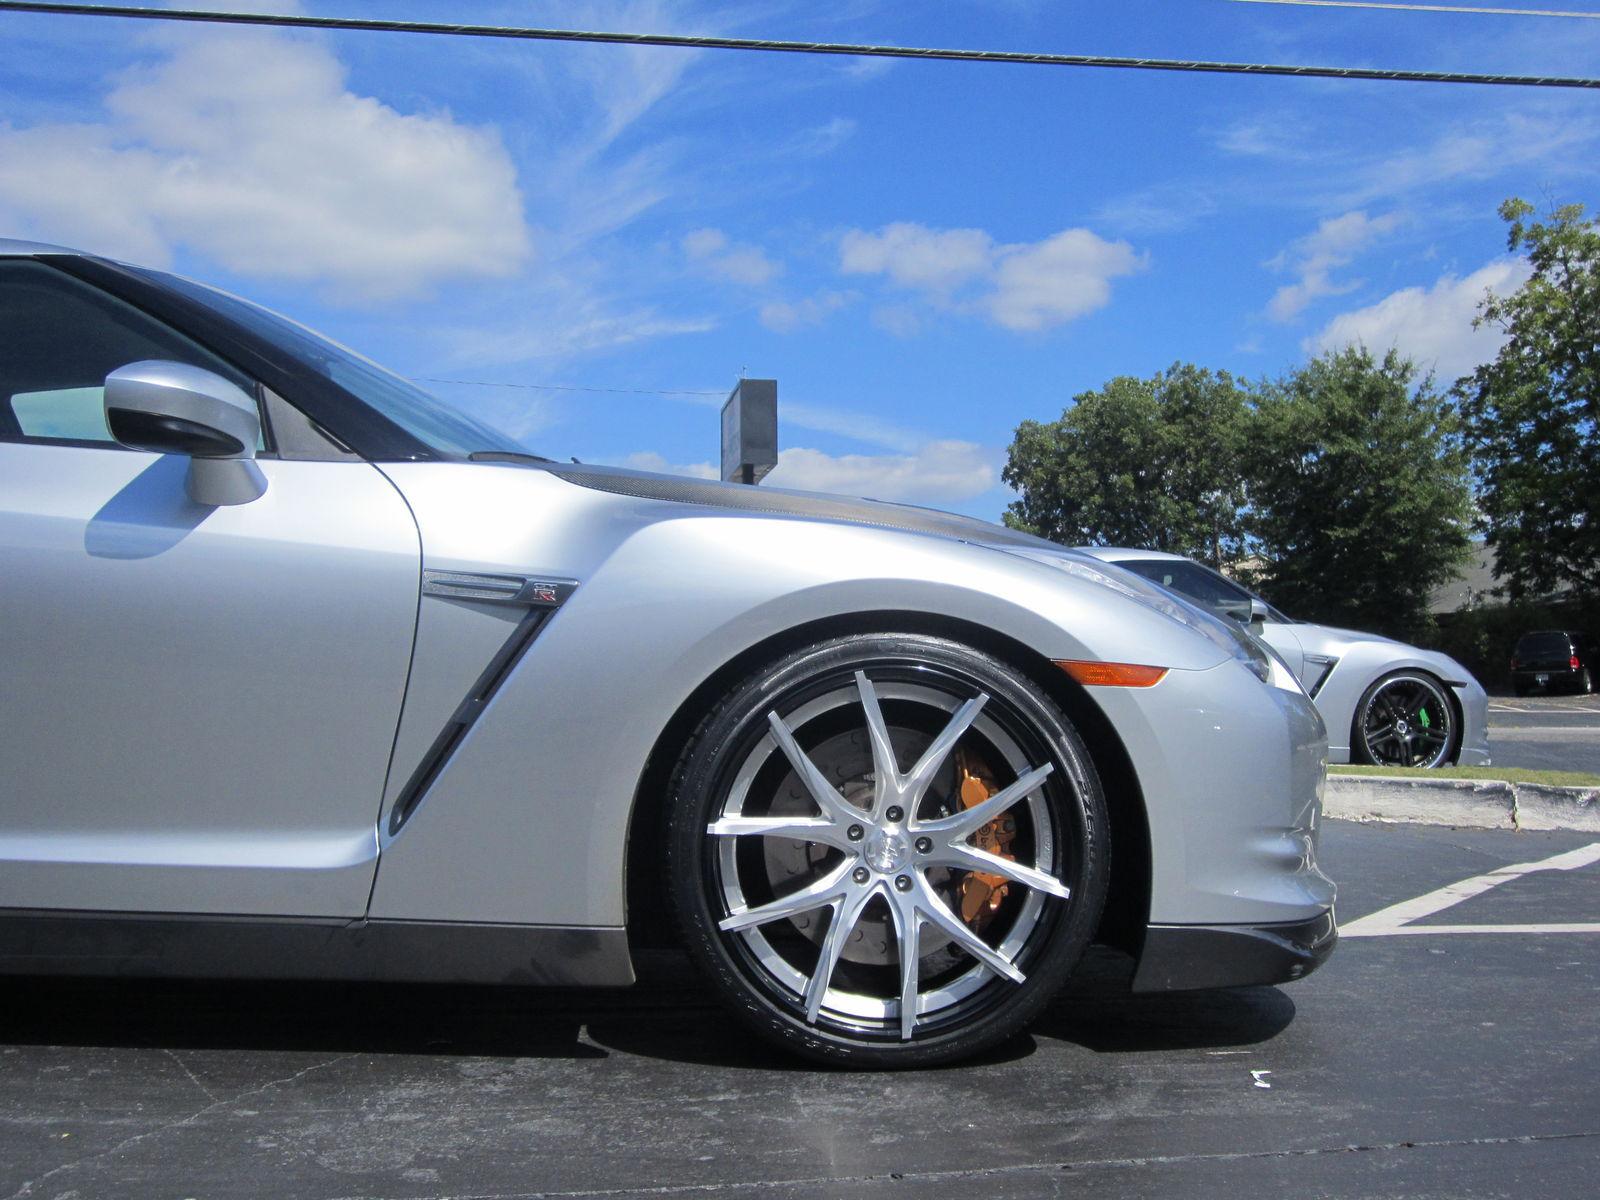 2013 Nissan GT-R | Nissan GTR on Lexani LZ-102's